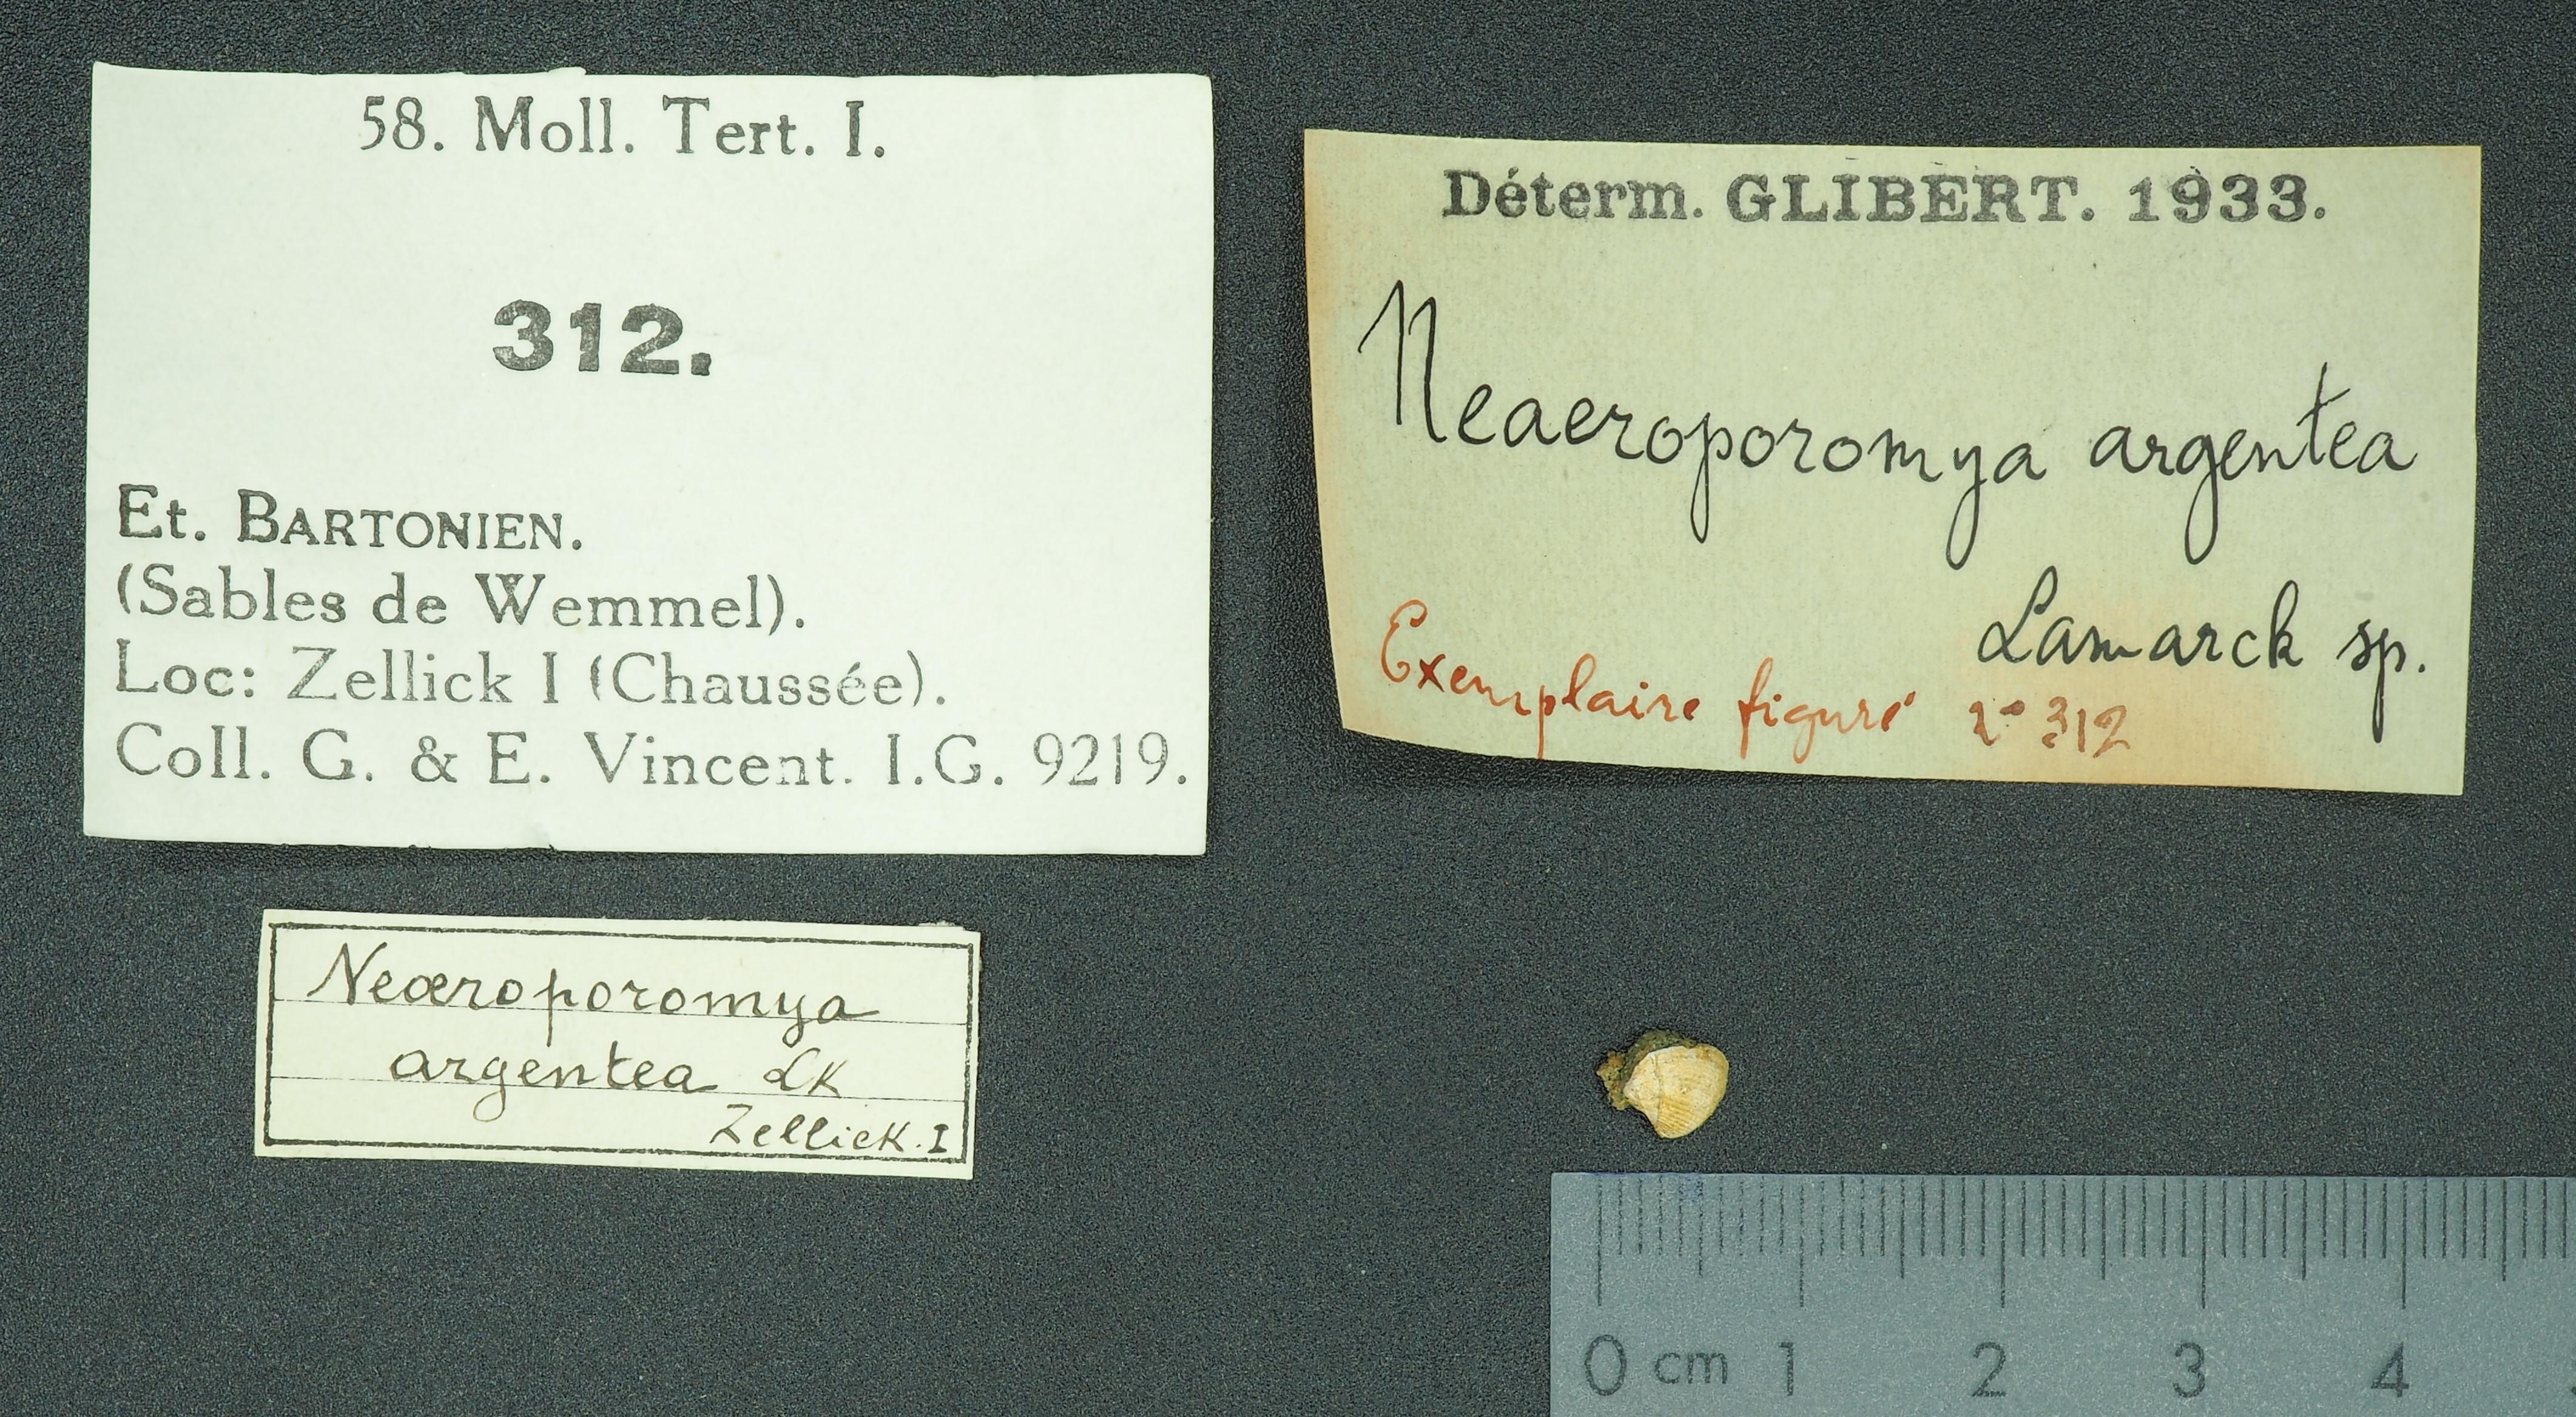 RBINS 312 - Neacroporomya argentea fig Lb